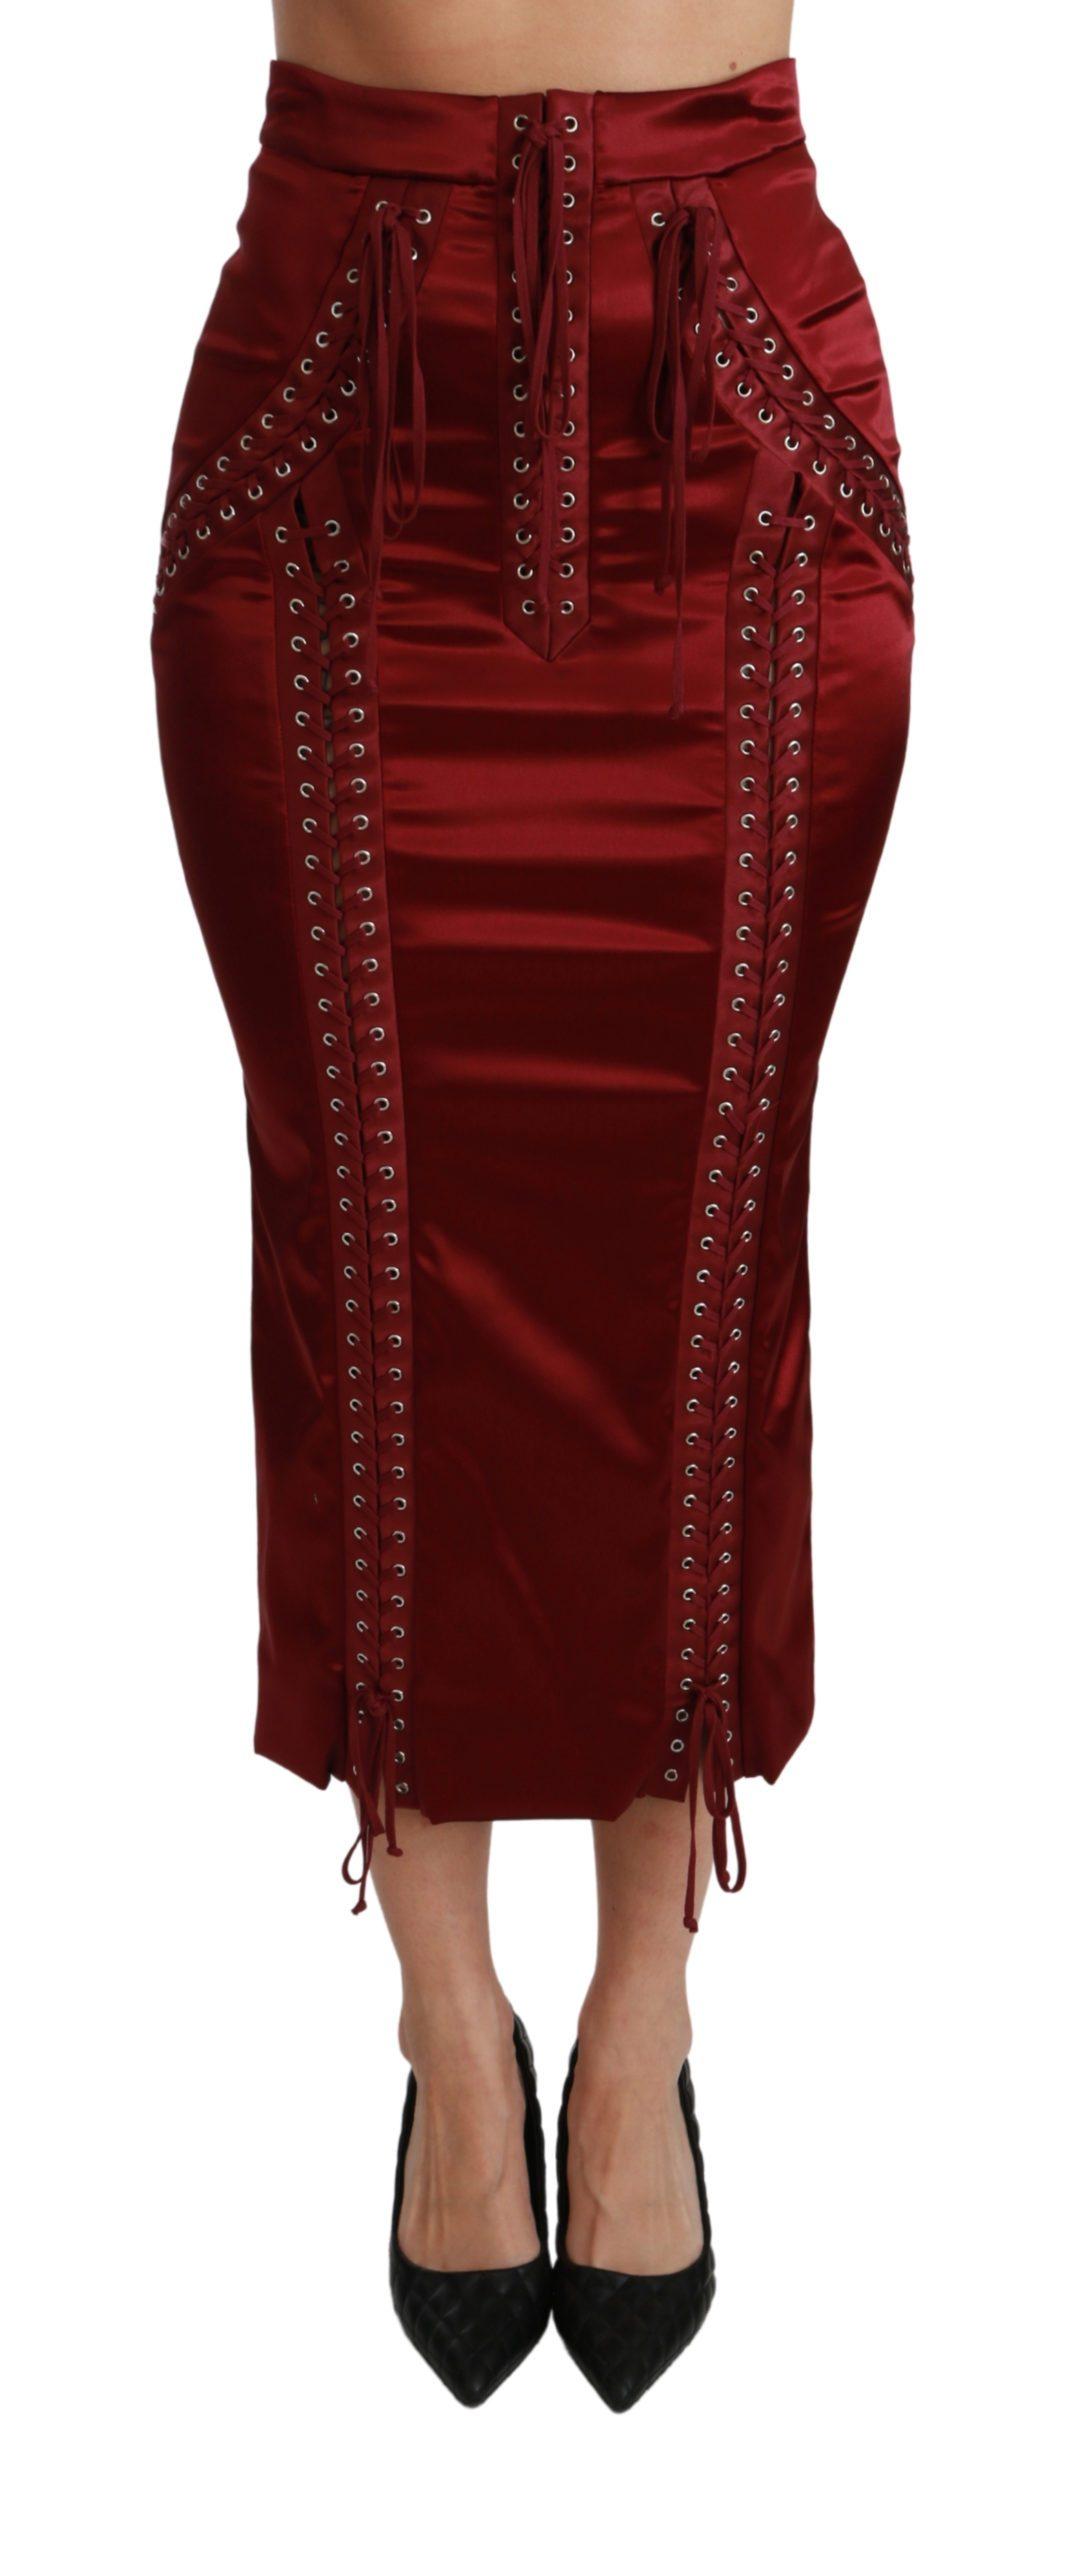 Dolce & Gabbana Women's High Waist Acetate Skirt Black SKI1414 - IT36 | XS